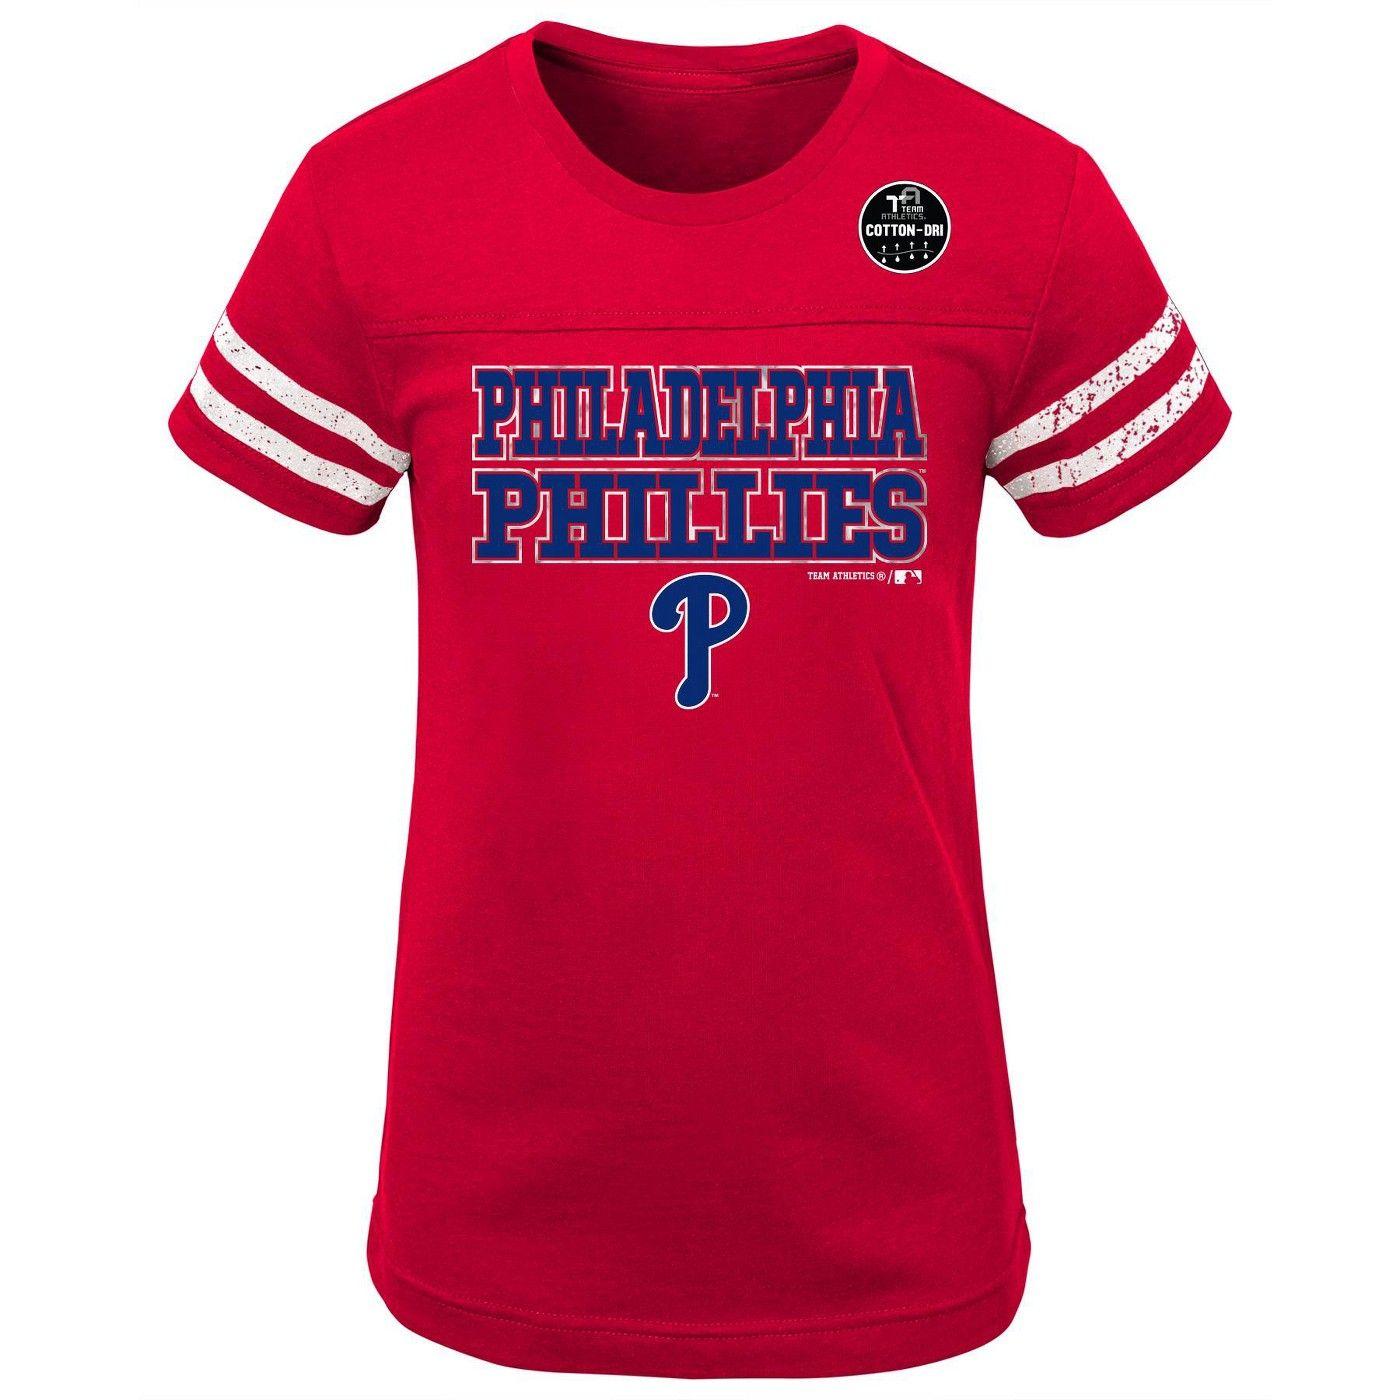 Philadelphia Phillies Girls' Double Play TShirt XS